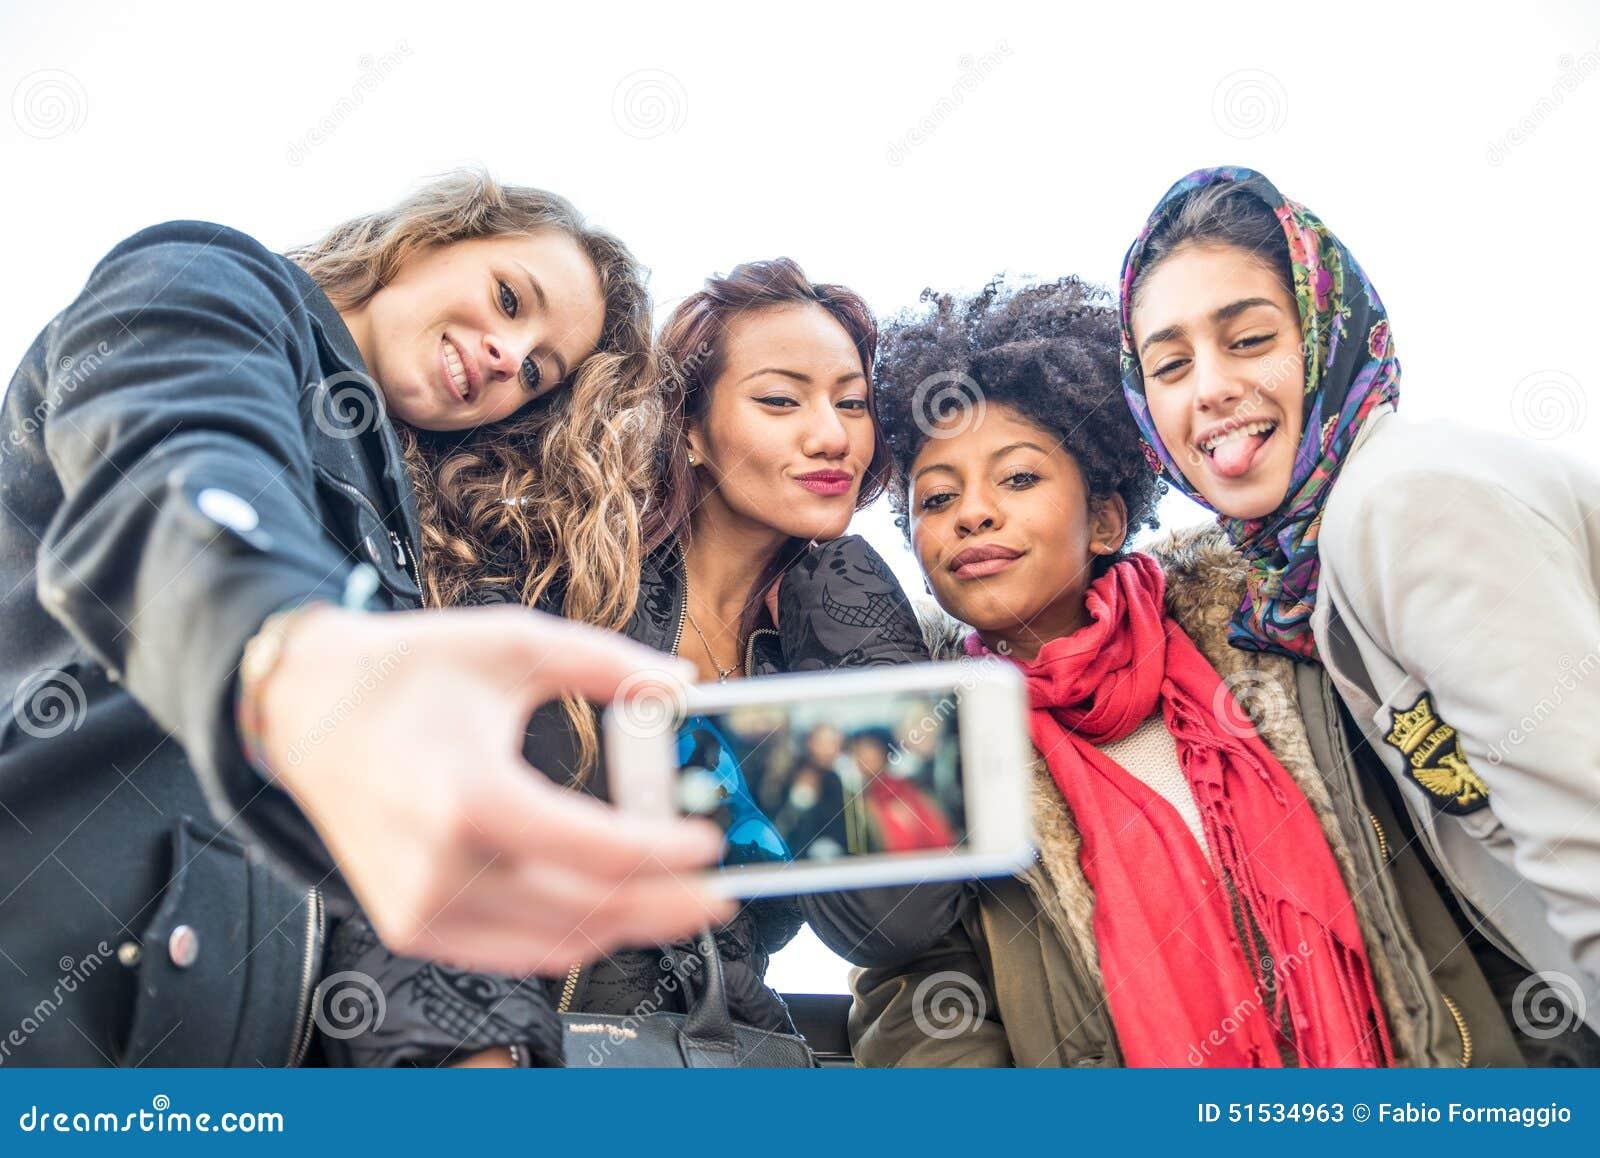 Shooting photo pour groupe damis Paris Ideecadeaufr